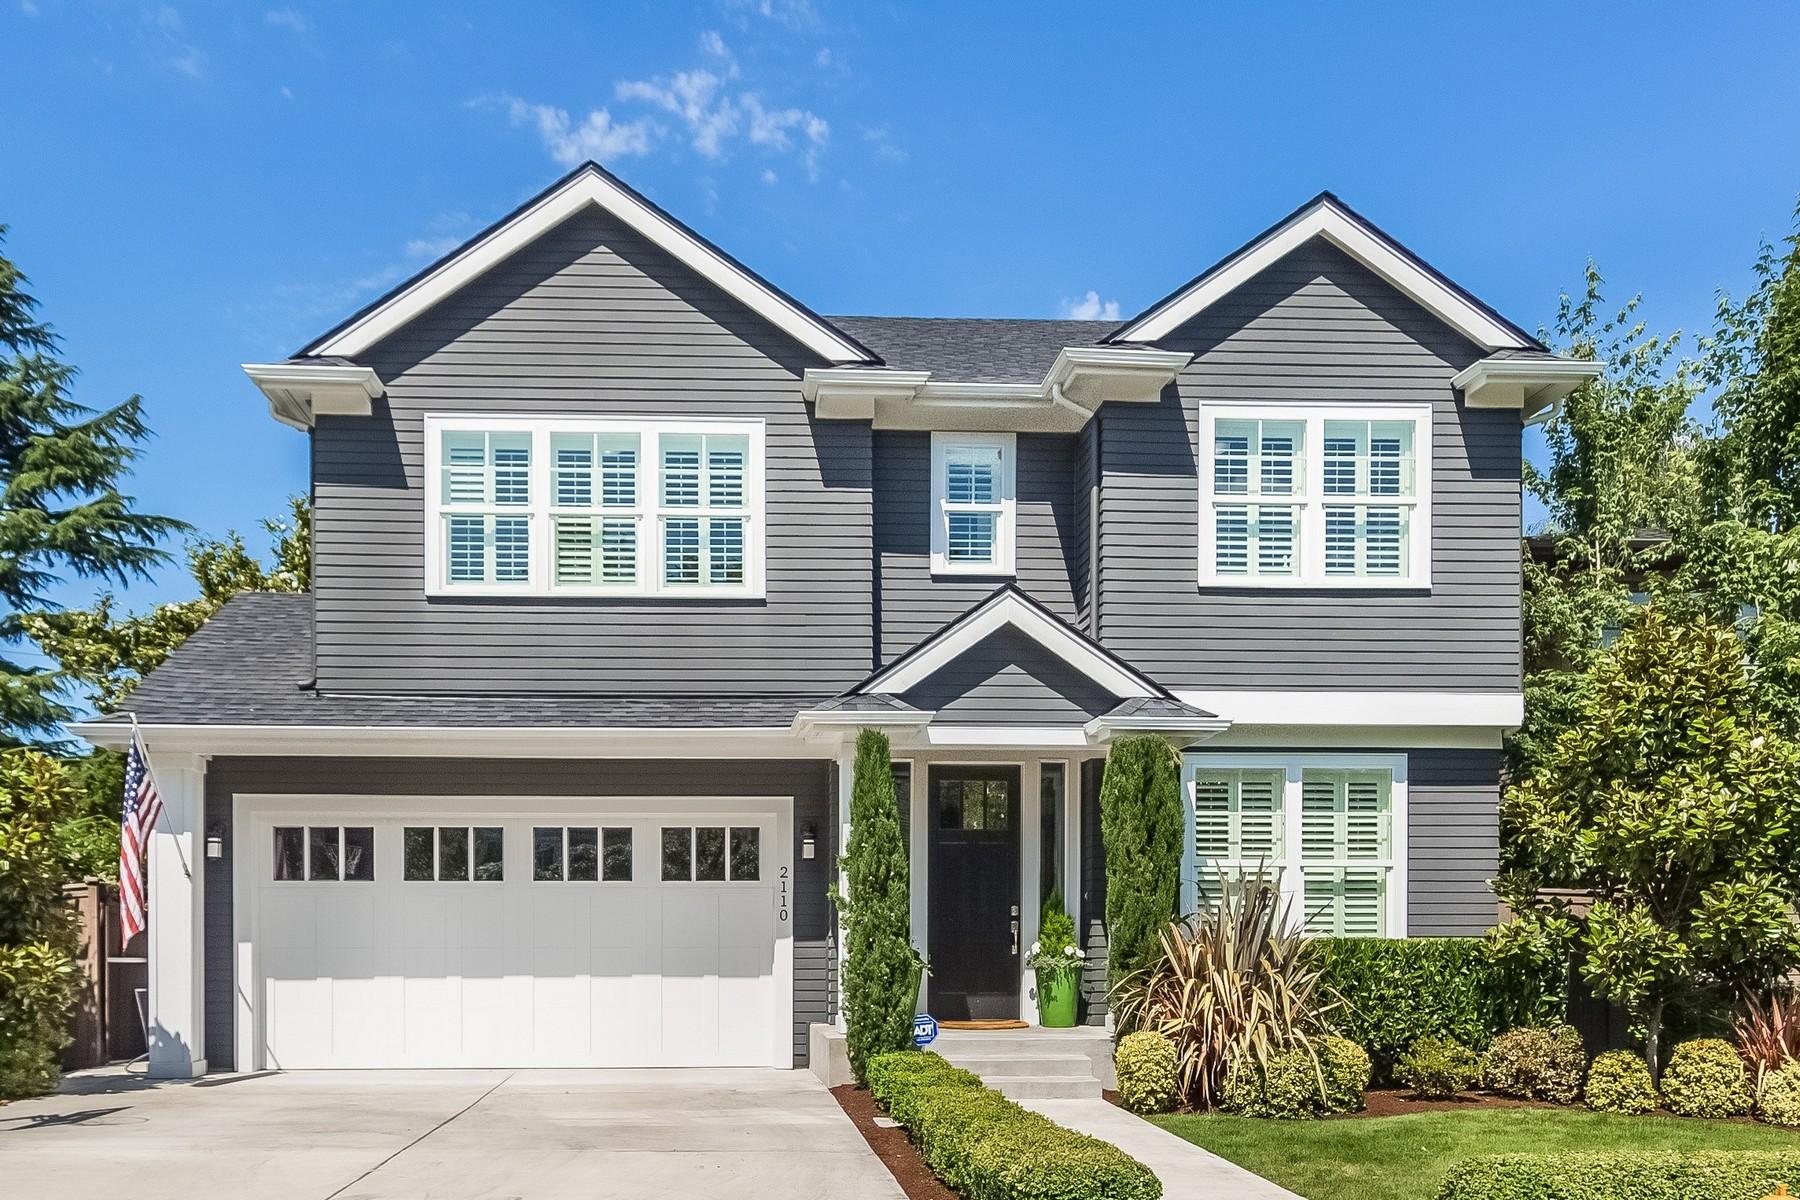 Villa per Vendita alle ore Stunning New Build Craftsman 2110 38th Ave E Madison Park, Seattle, Washington, 98112 Stati Uniti